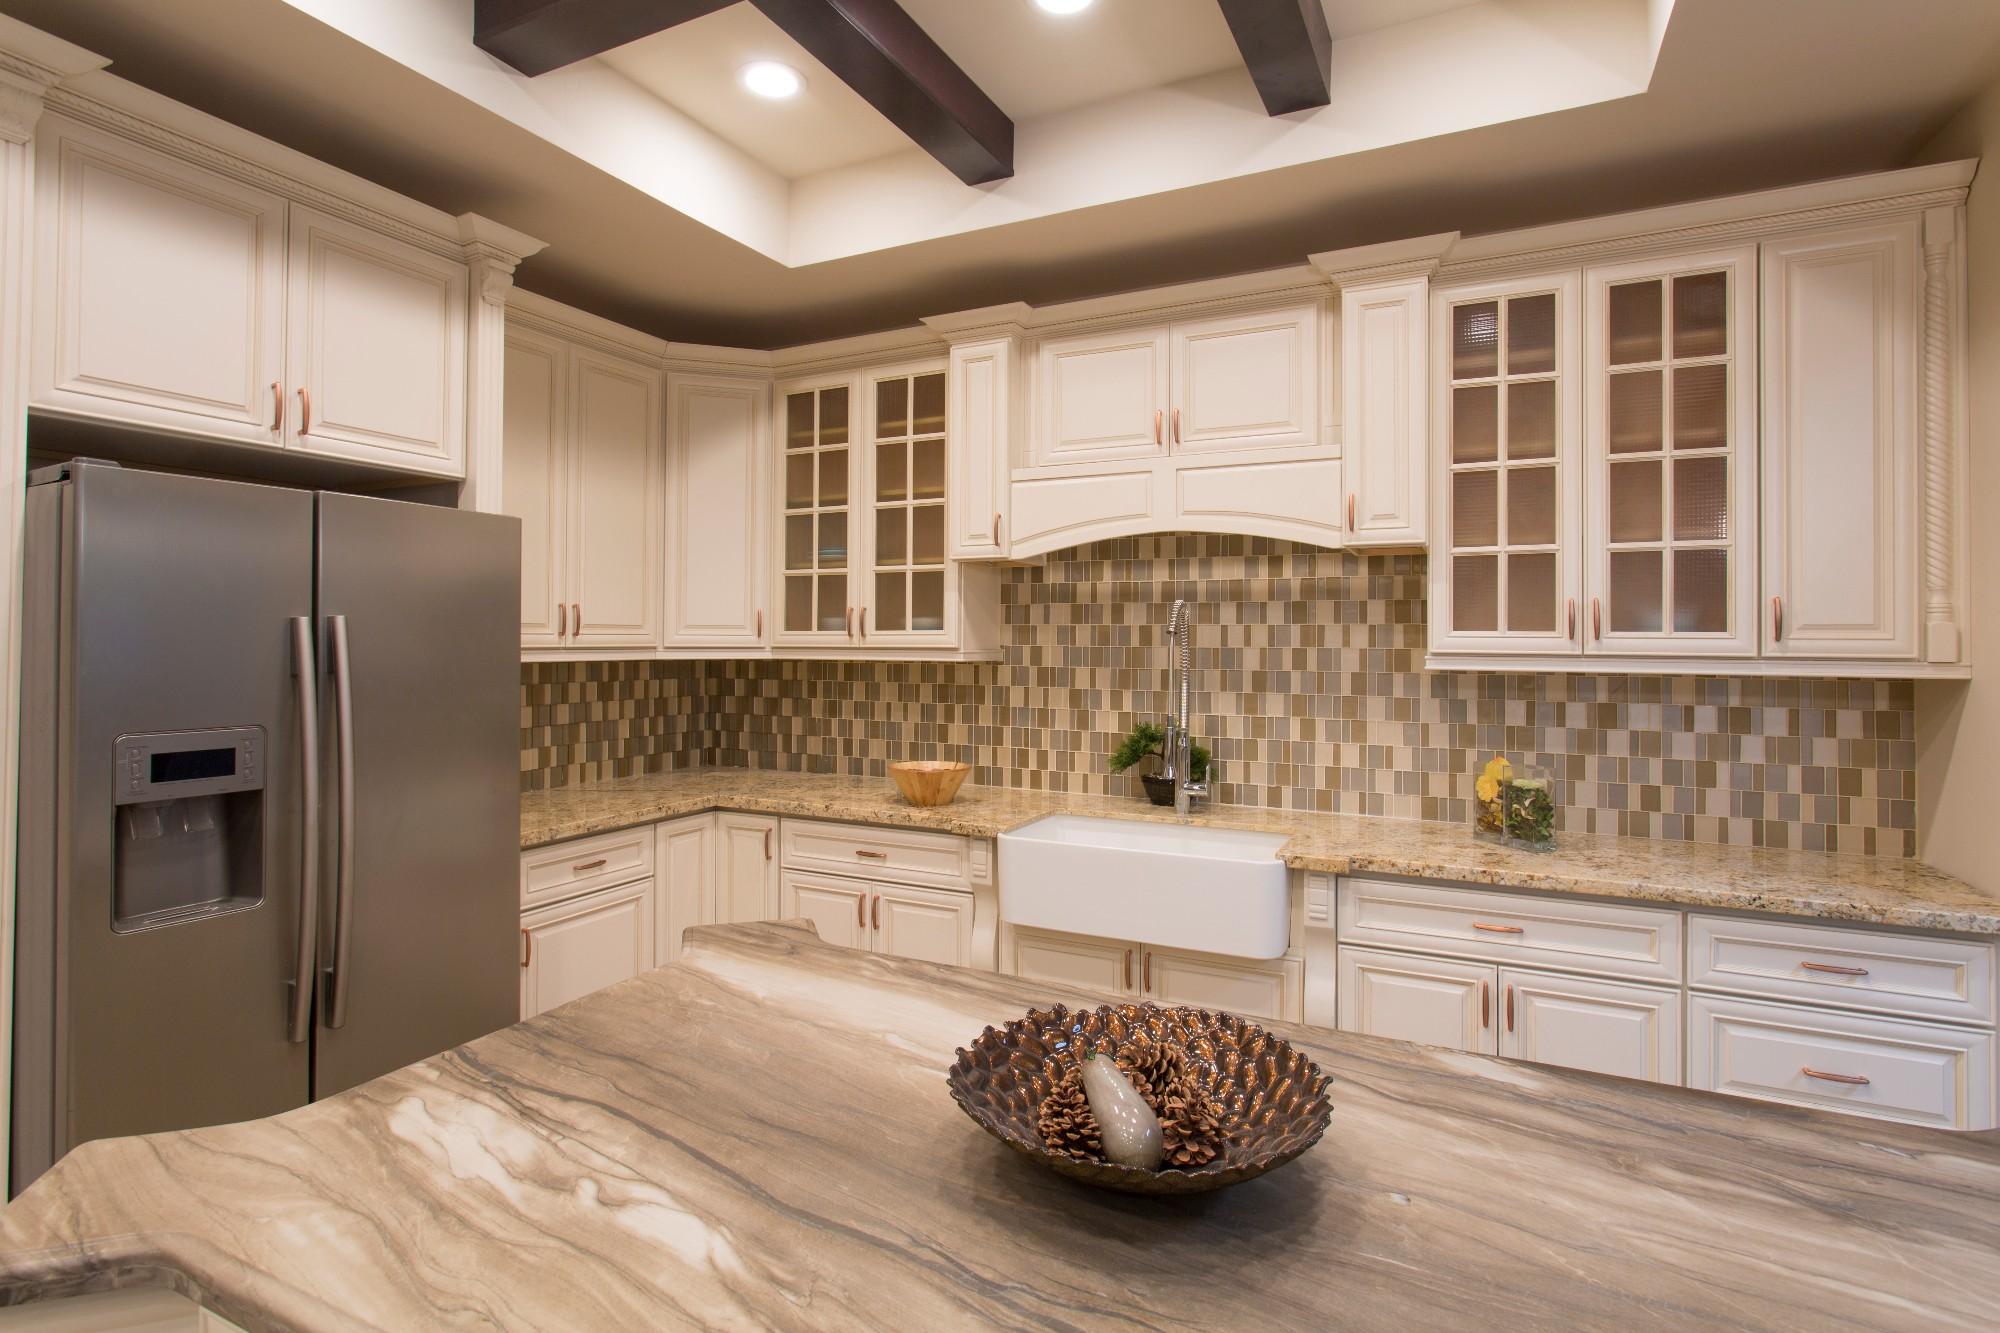 Antique White Solidwood Kitchen Cabinet Manufacturers, Antique White Solidwood Kitchen Cabinet Factory, Supply Antique White Solidwood Kitchen Cabinet